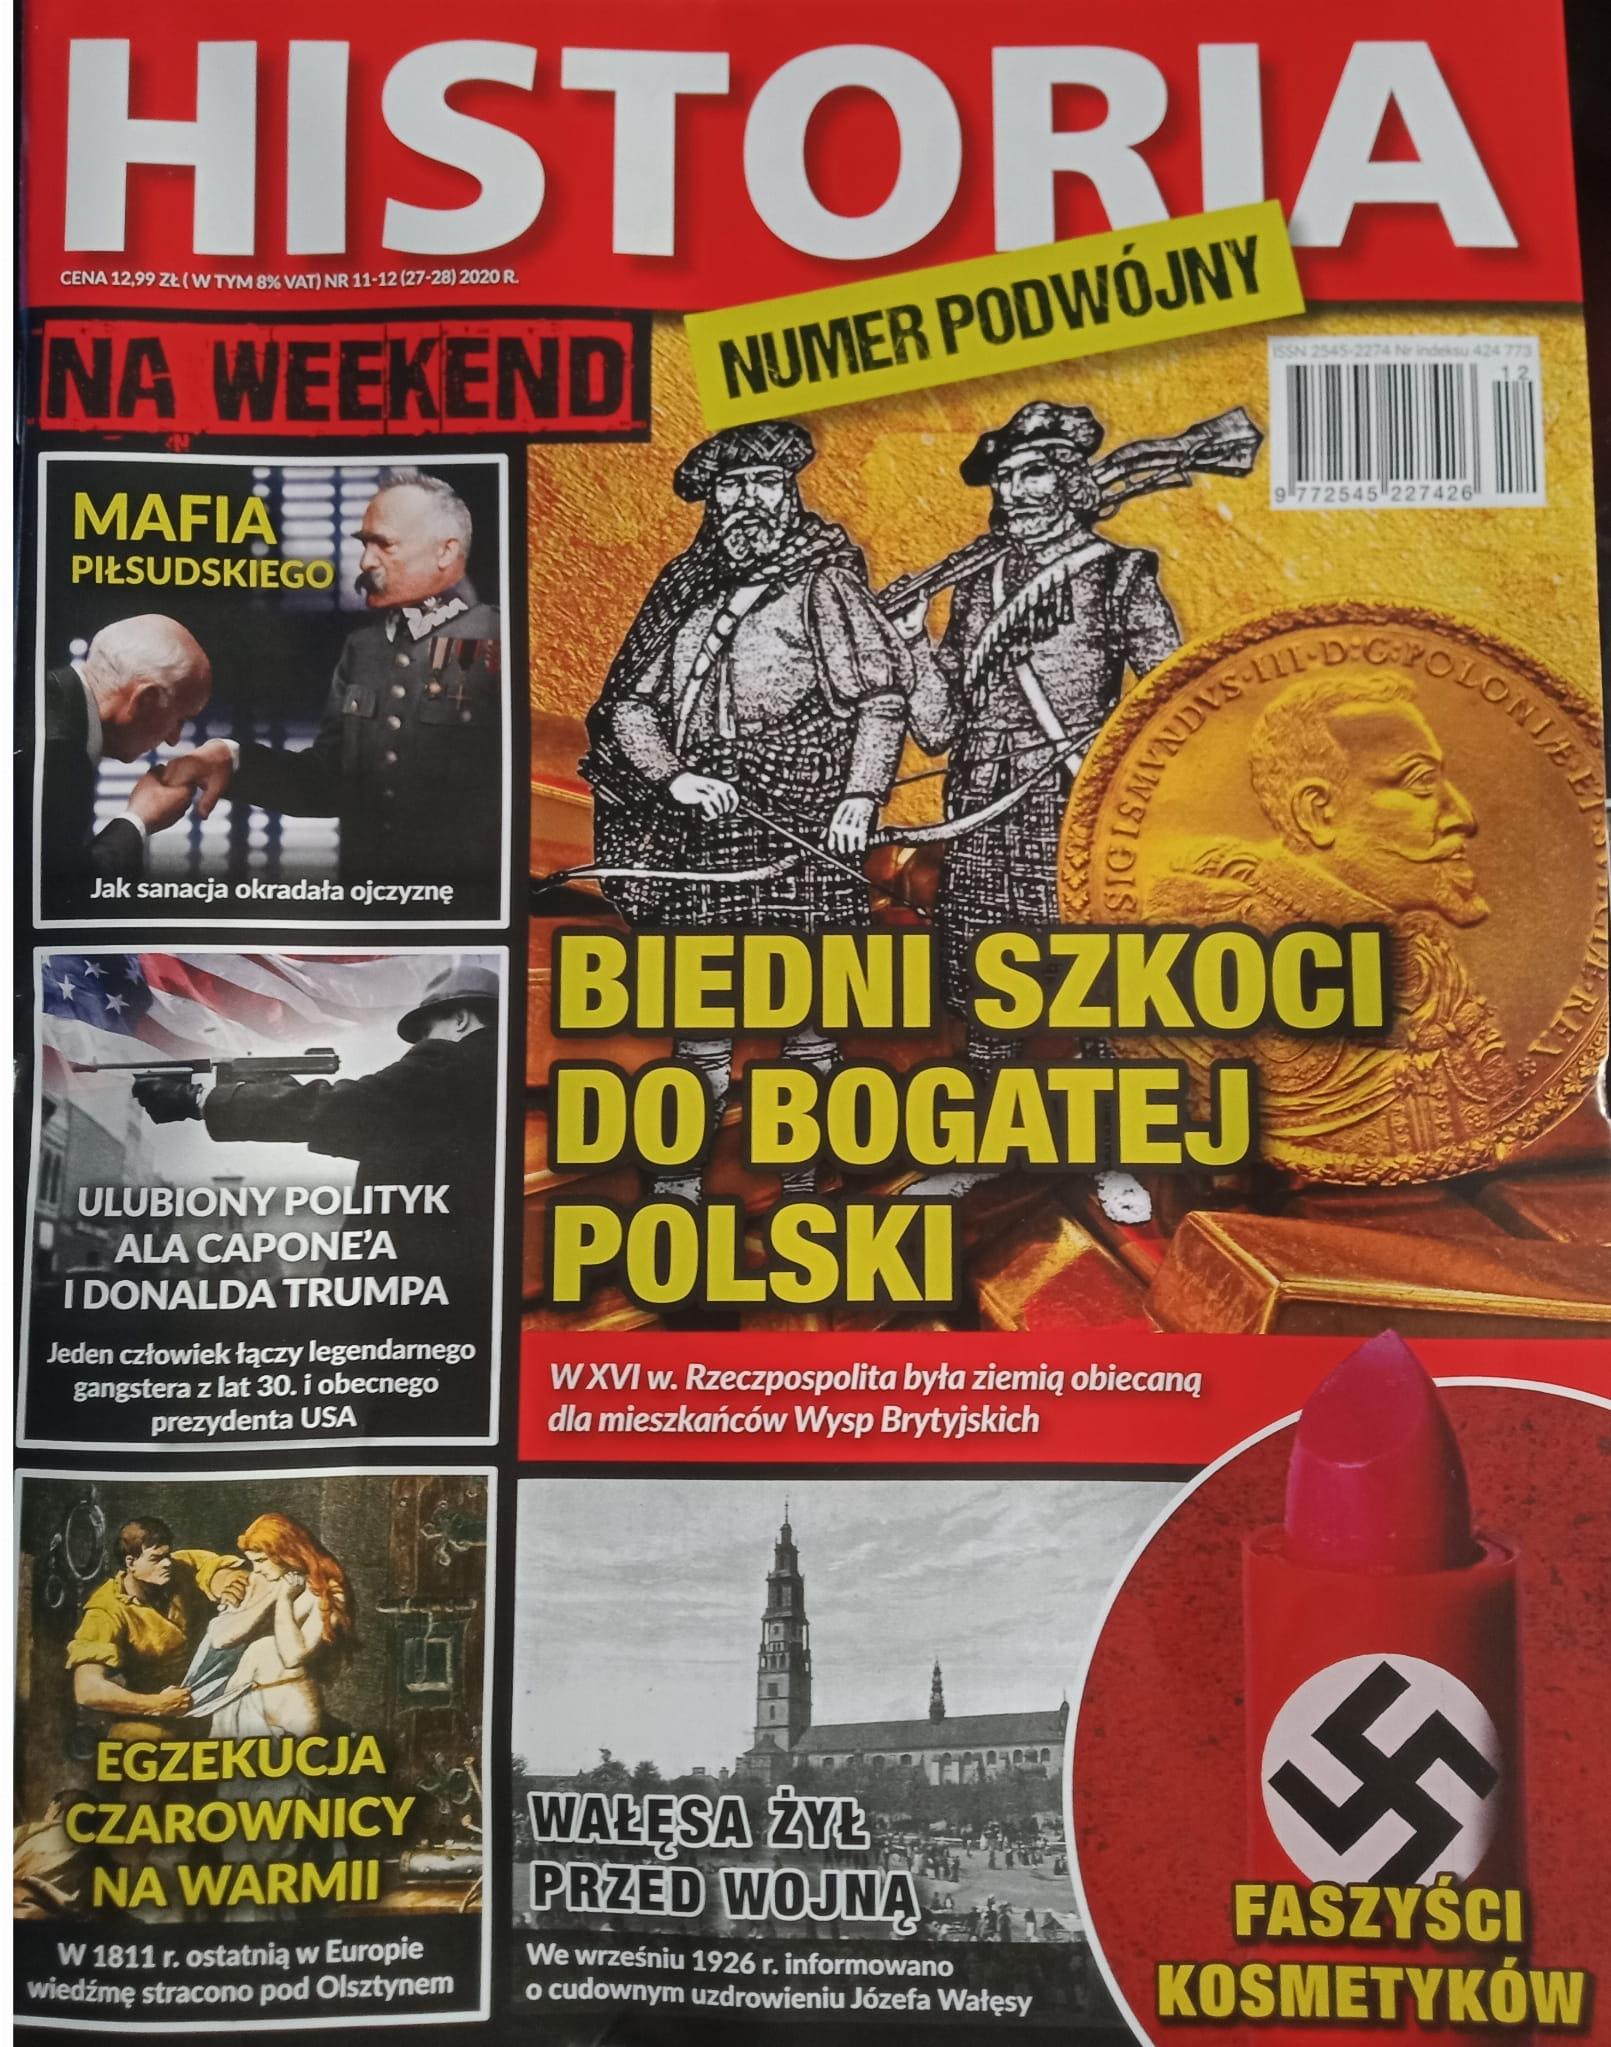 Historia na weekend nr 11-12 (27-28) 2020 r.